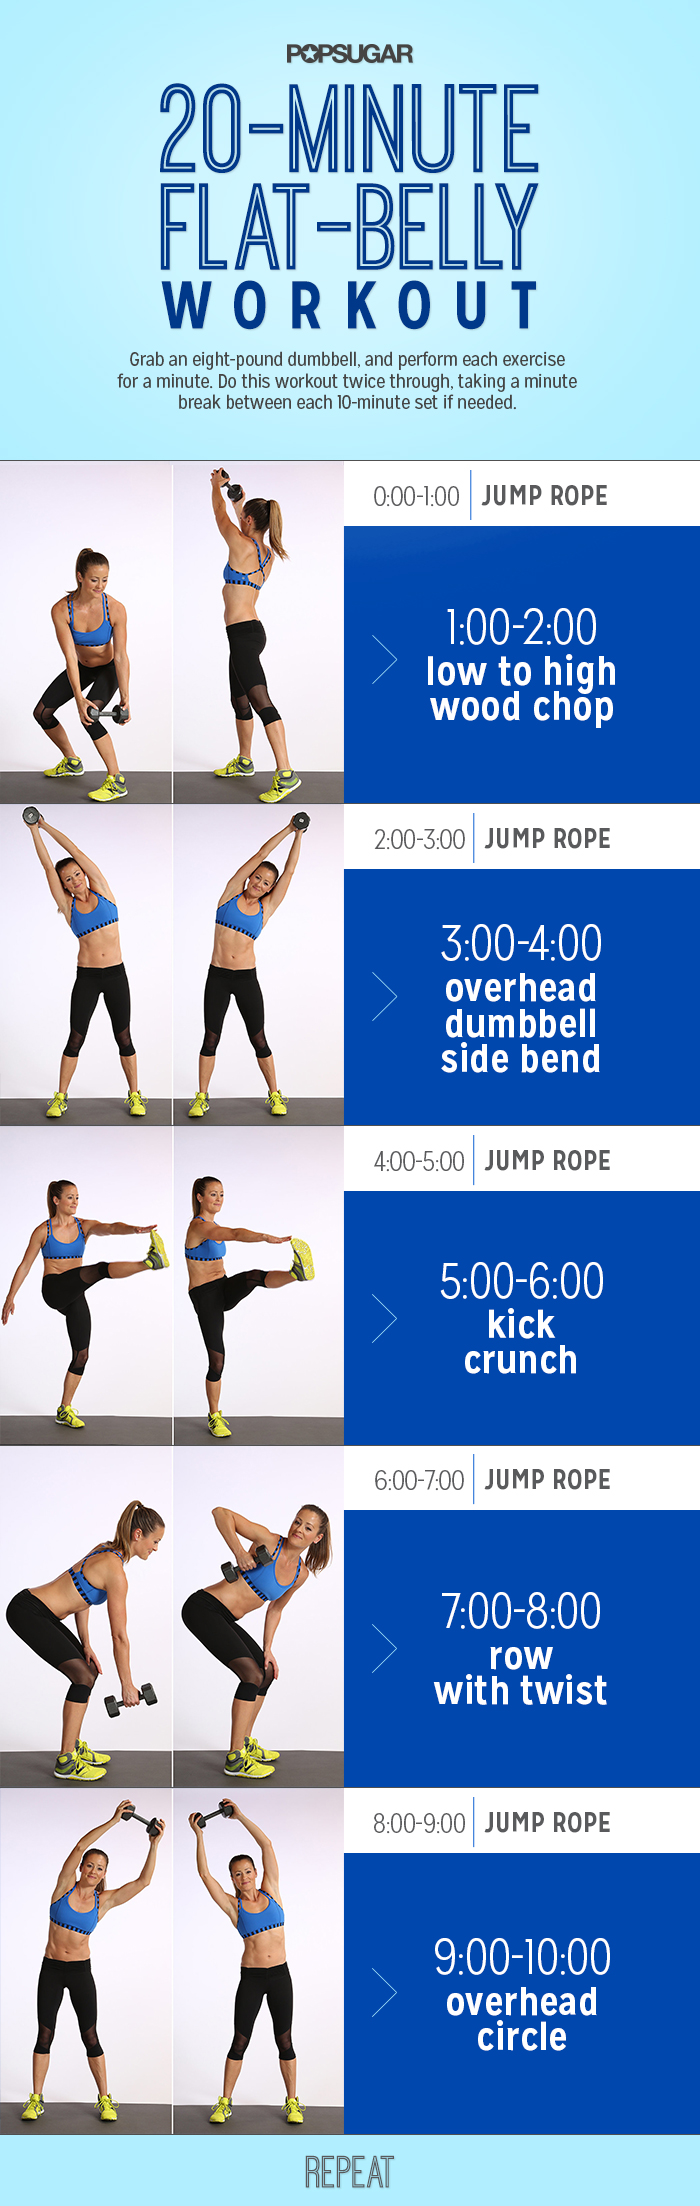 Flat-Belly Challenge Day 11 | POPSUGAR Fitness